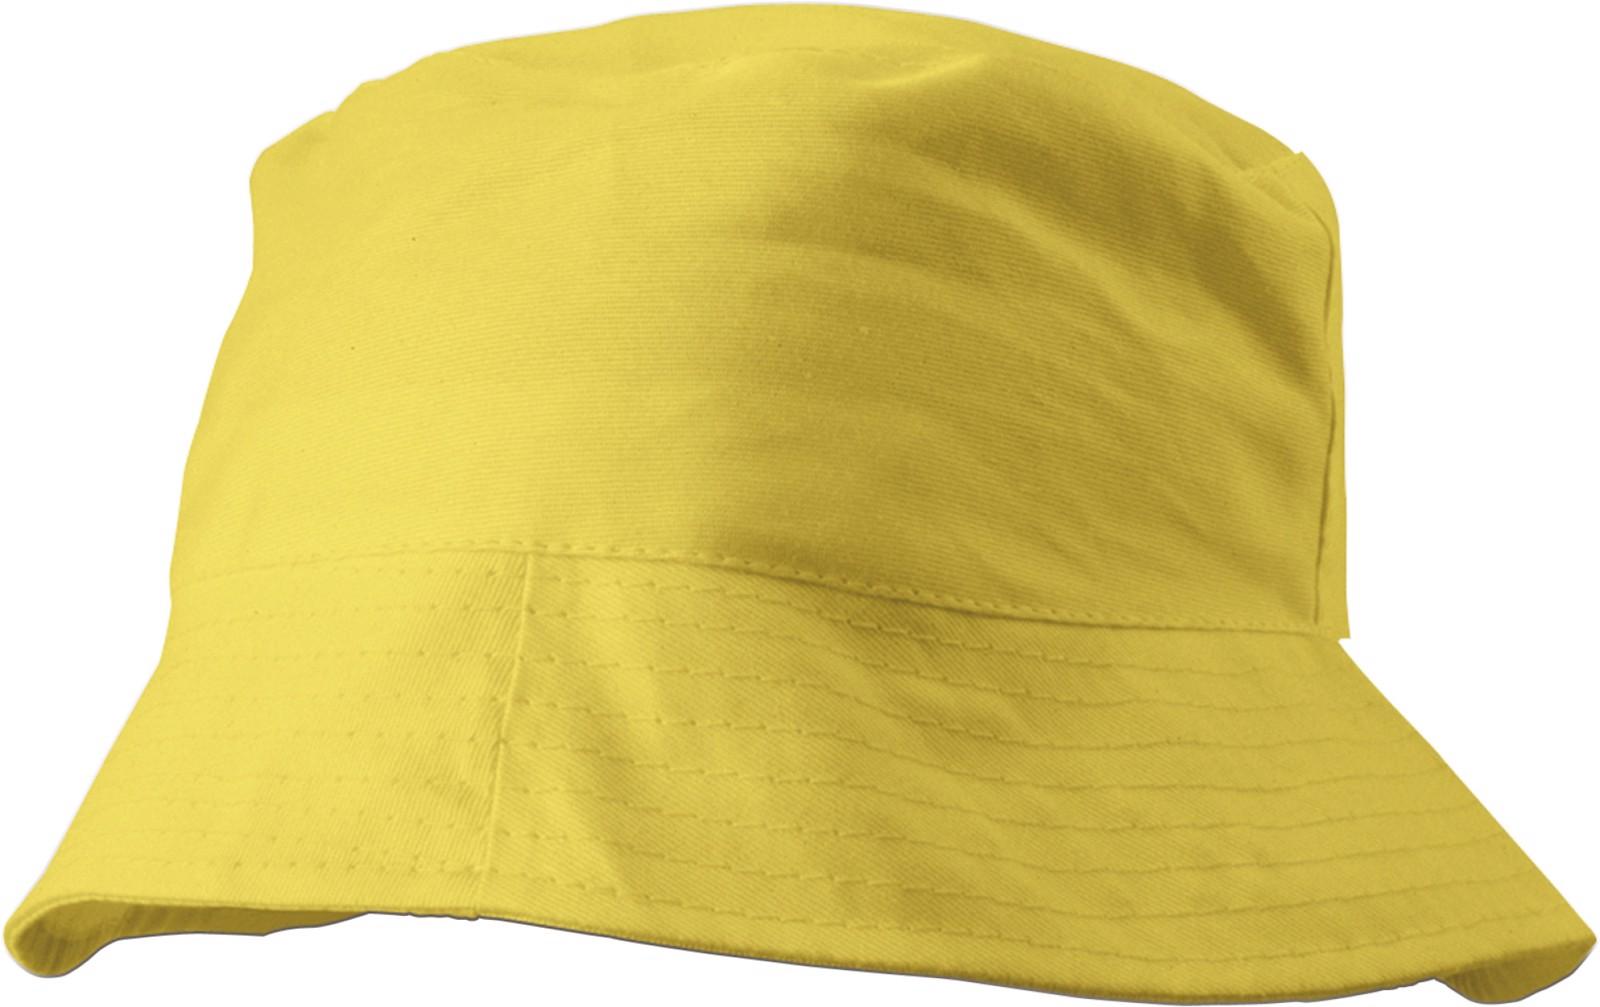 Cotton sun hat - Yellow